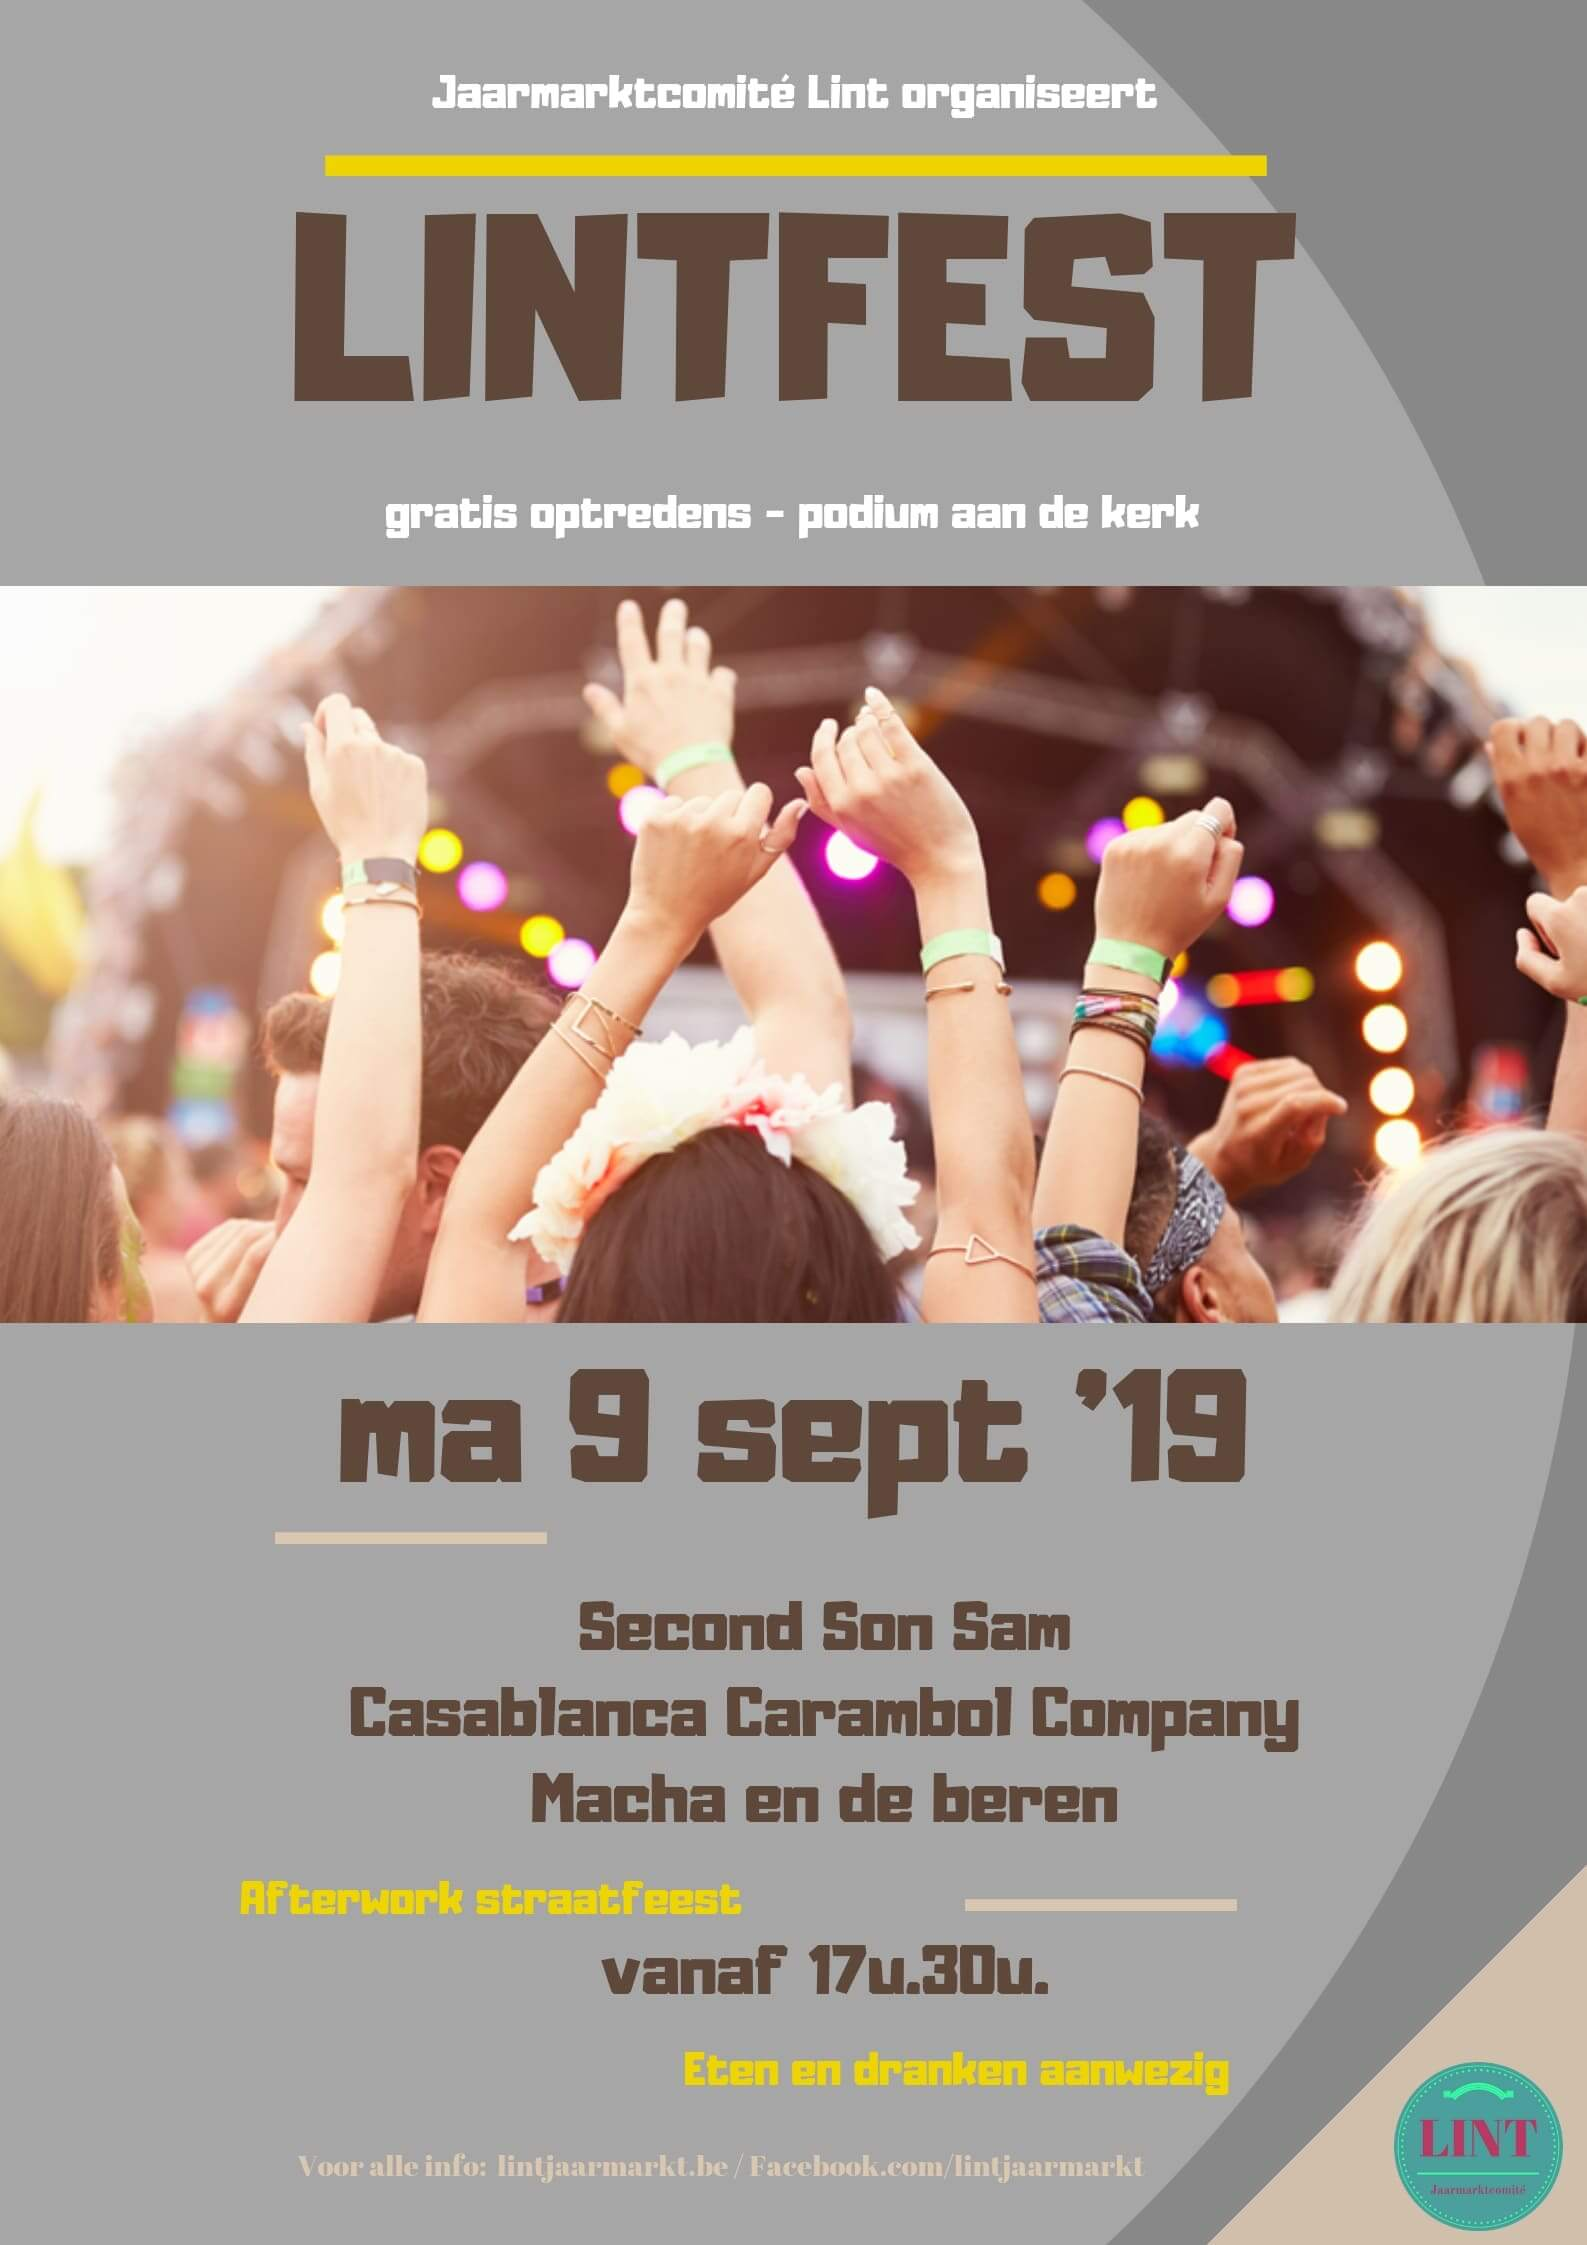 LintFest 2019